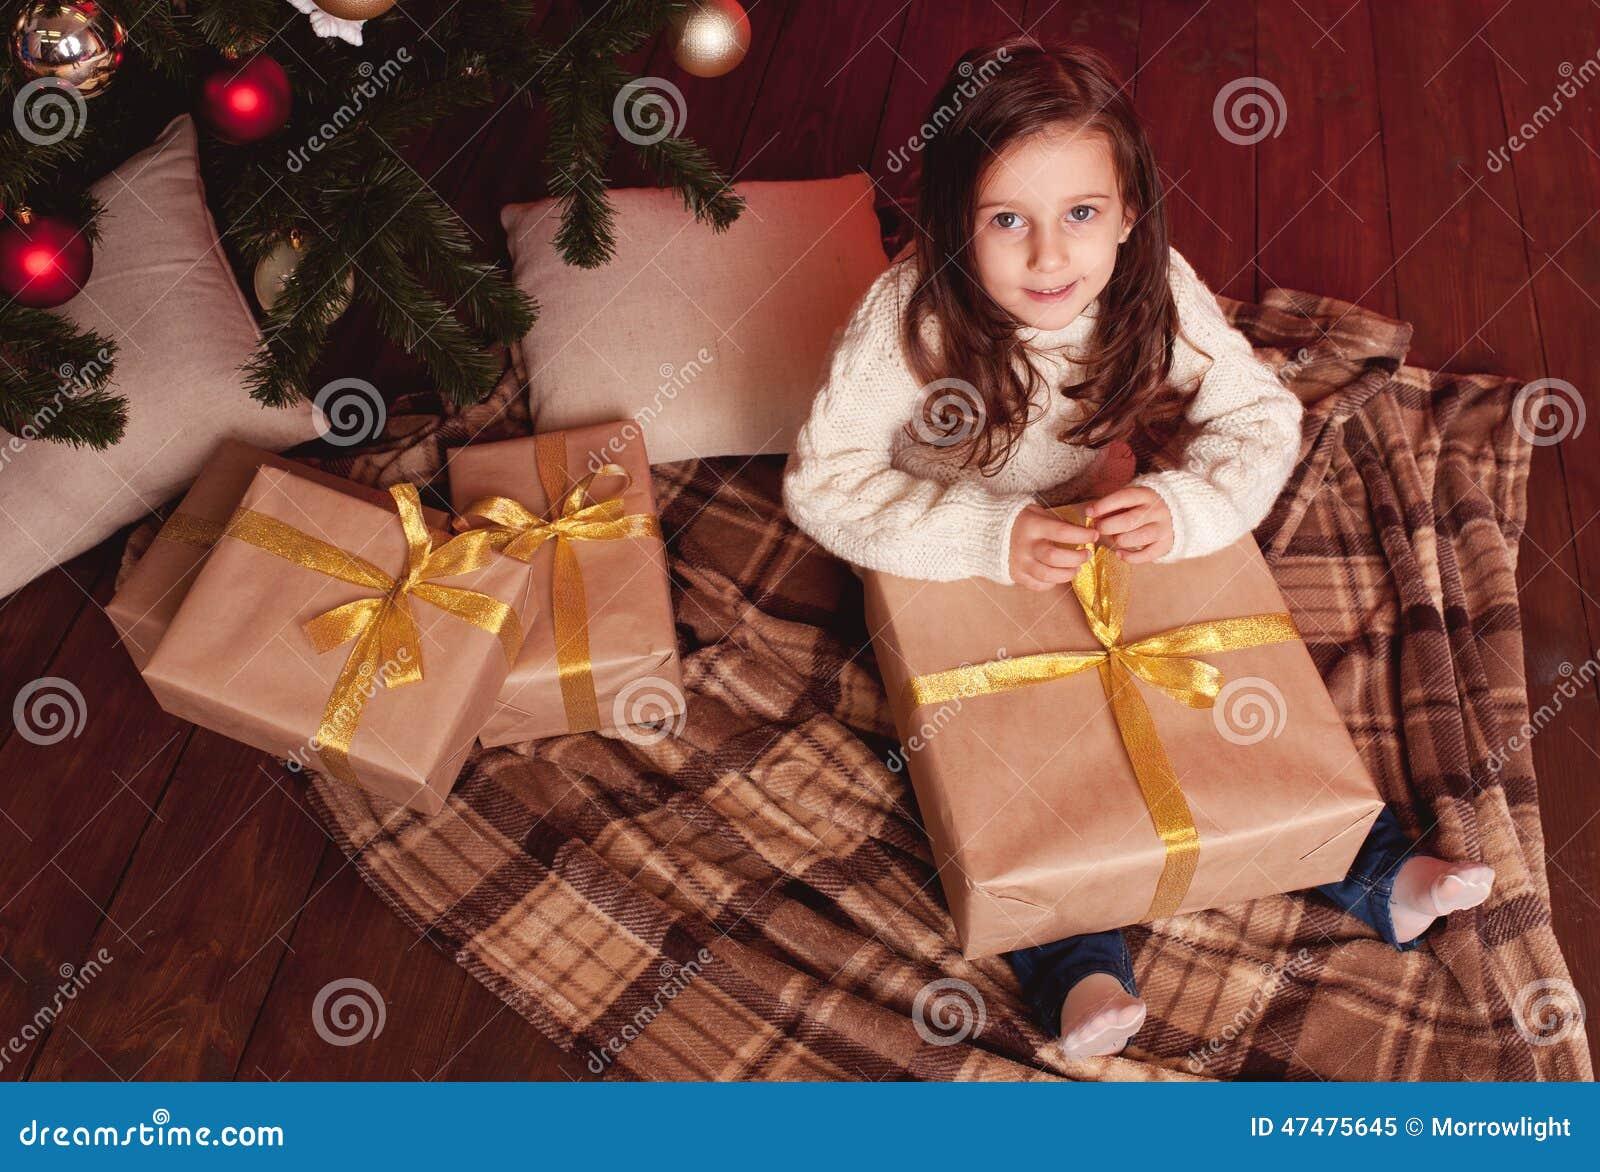 Smiling girl opening christmas presents Girl Opening Christmas Presents Stock Image - of